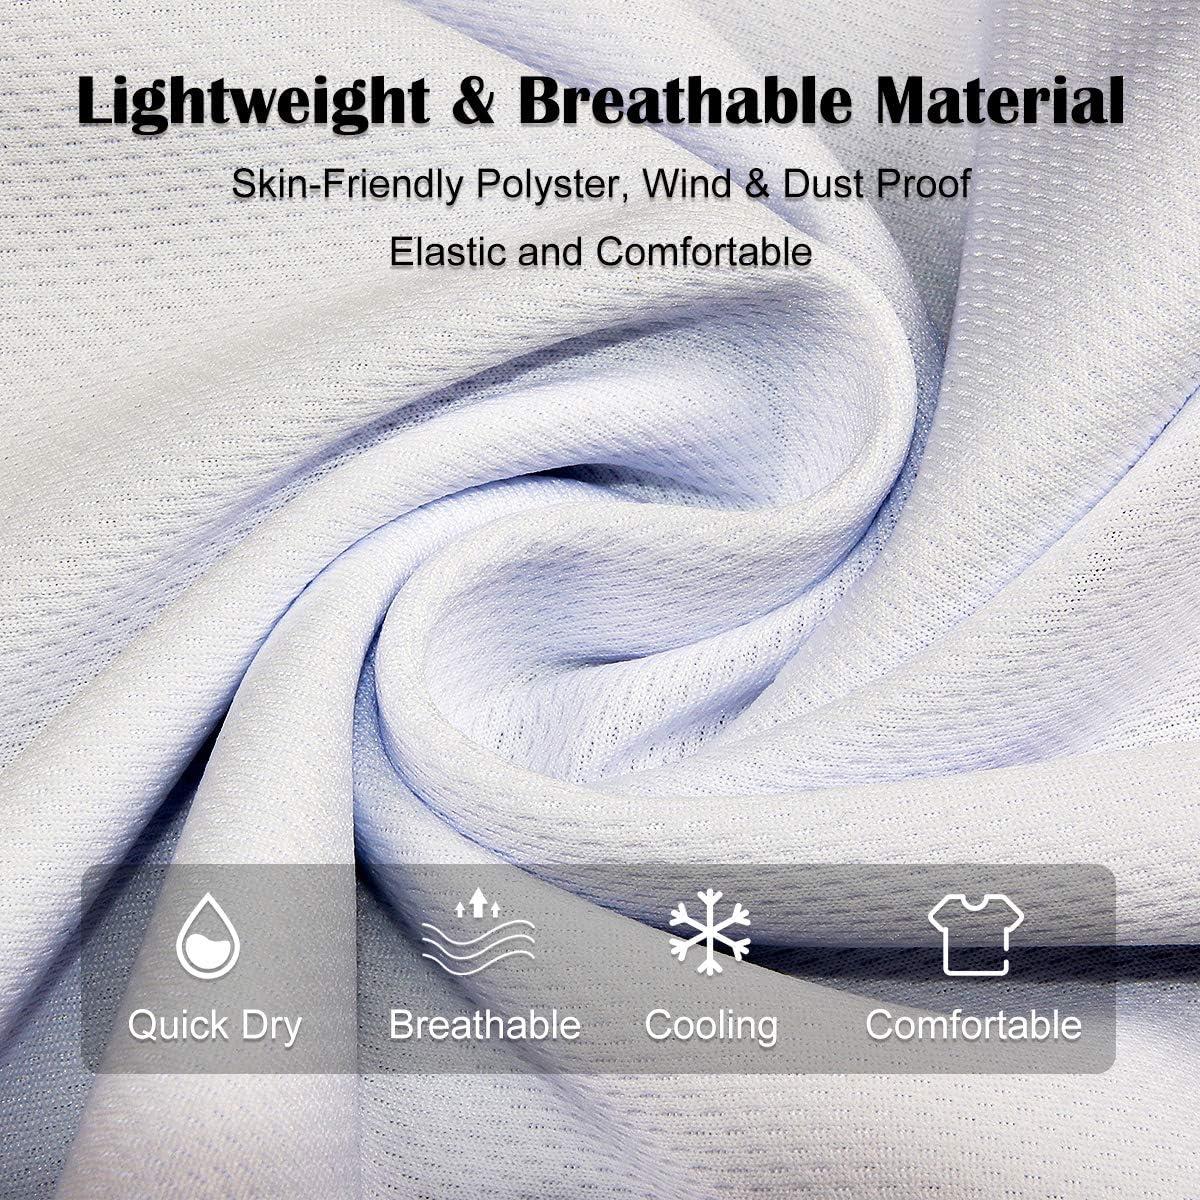 CALODY 3 Pcs Breathable Cooling Bandana UV Protection Neck Gaiter Face Mask, Reusable Face Cover Scarf for Men&Women